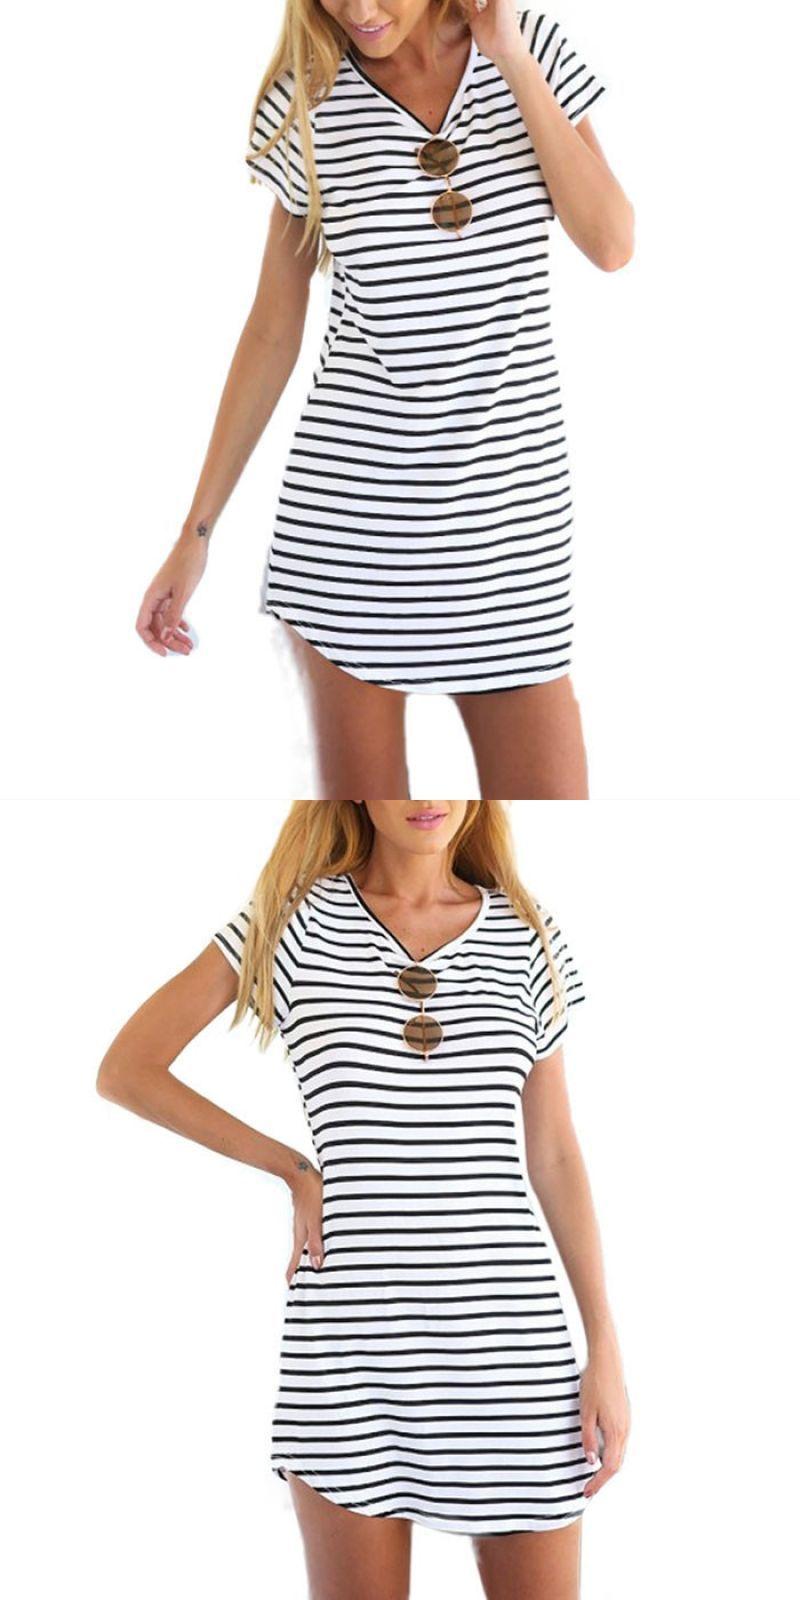 38c02152a769b6 Fashion vestidos women casual black white stripe summer dress short sleeve  o neck mini dress t shirt dress  428  cotton  casual  a-line  striped   short ...